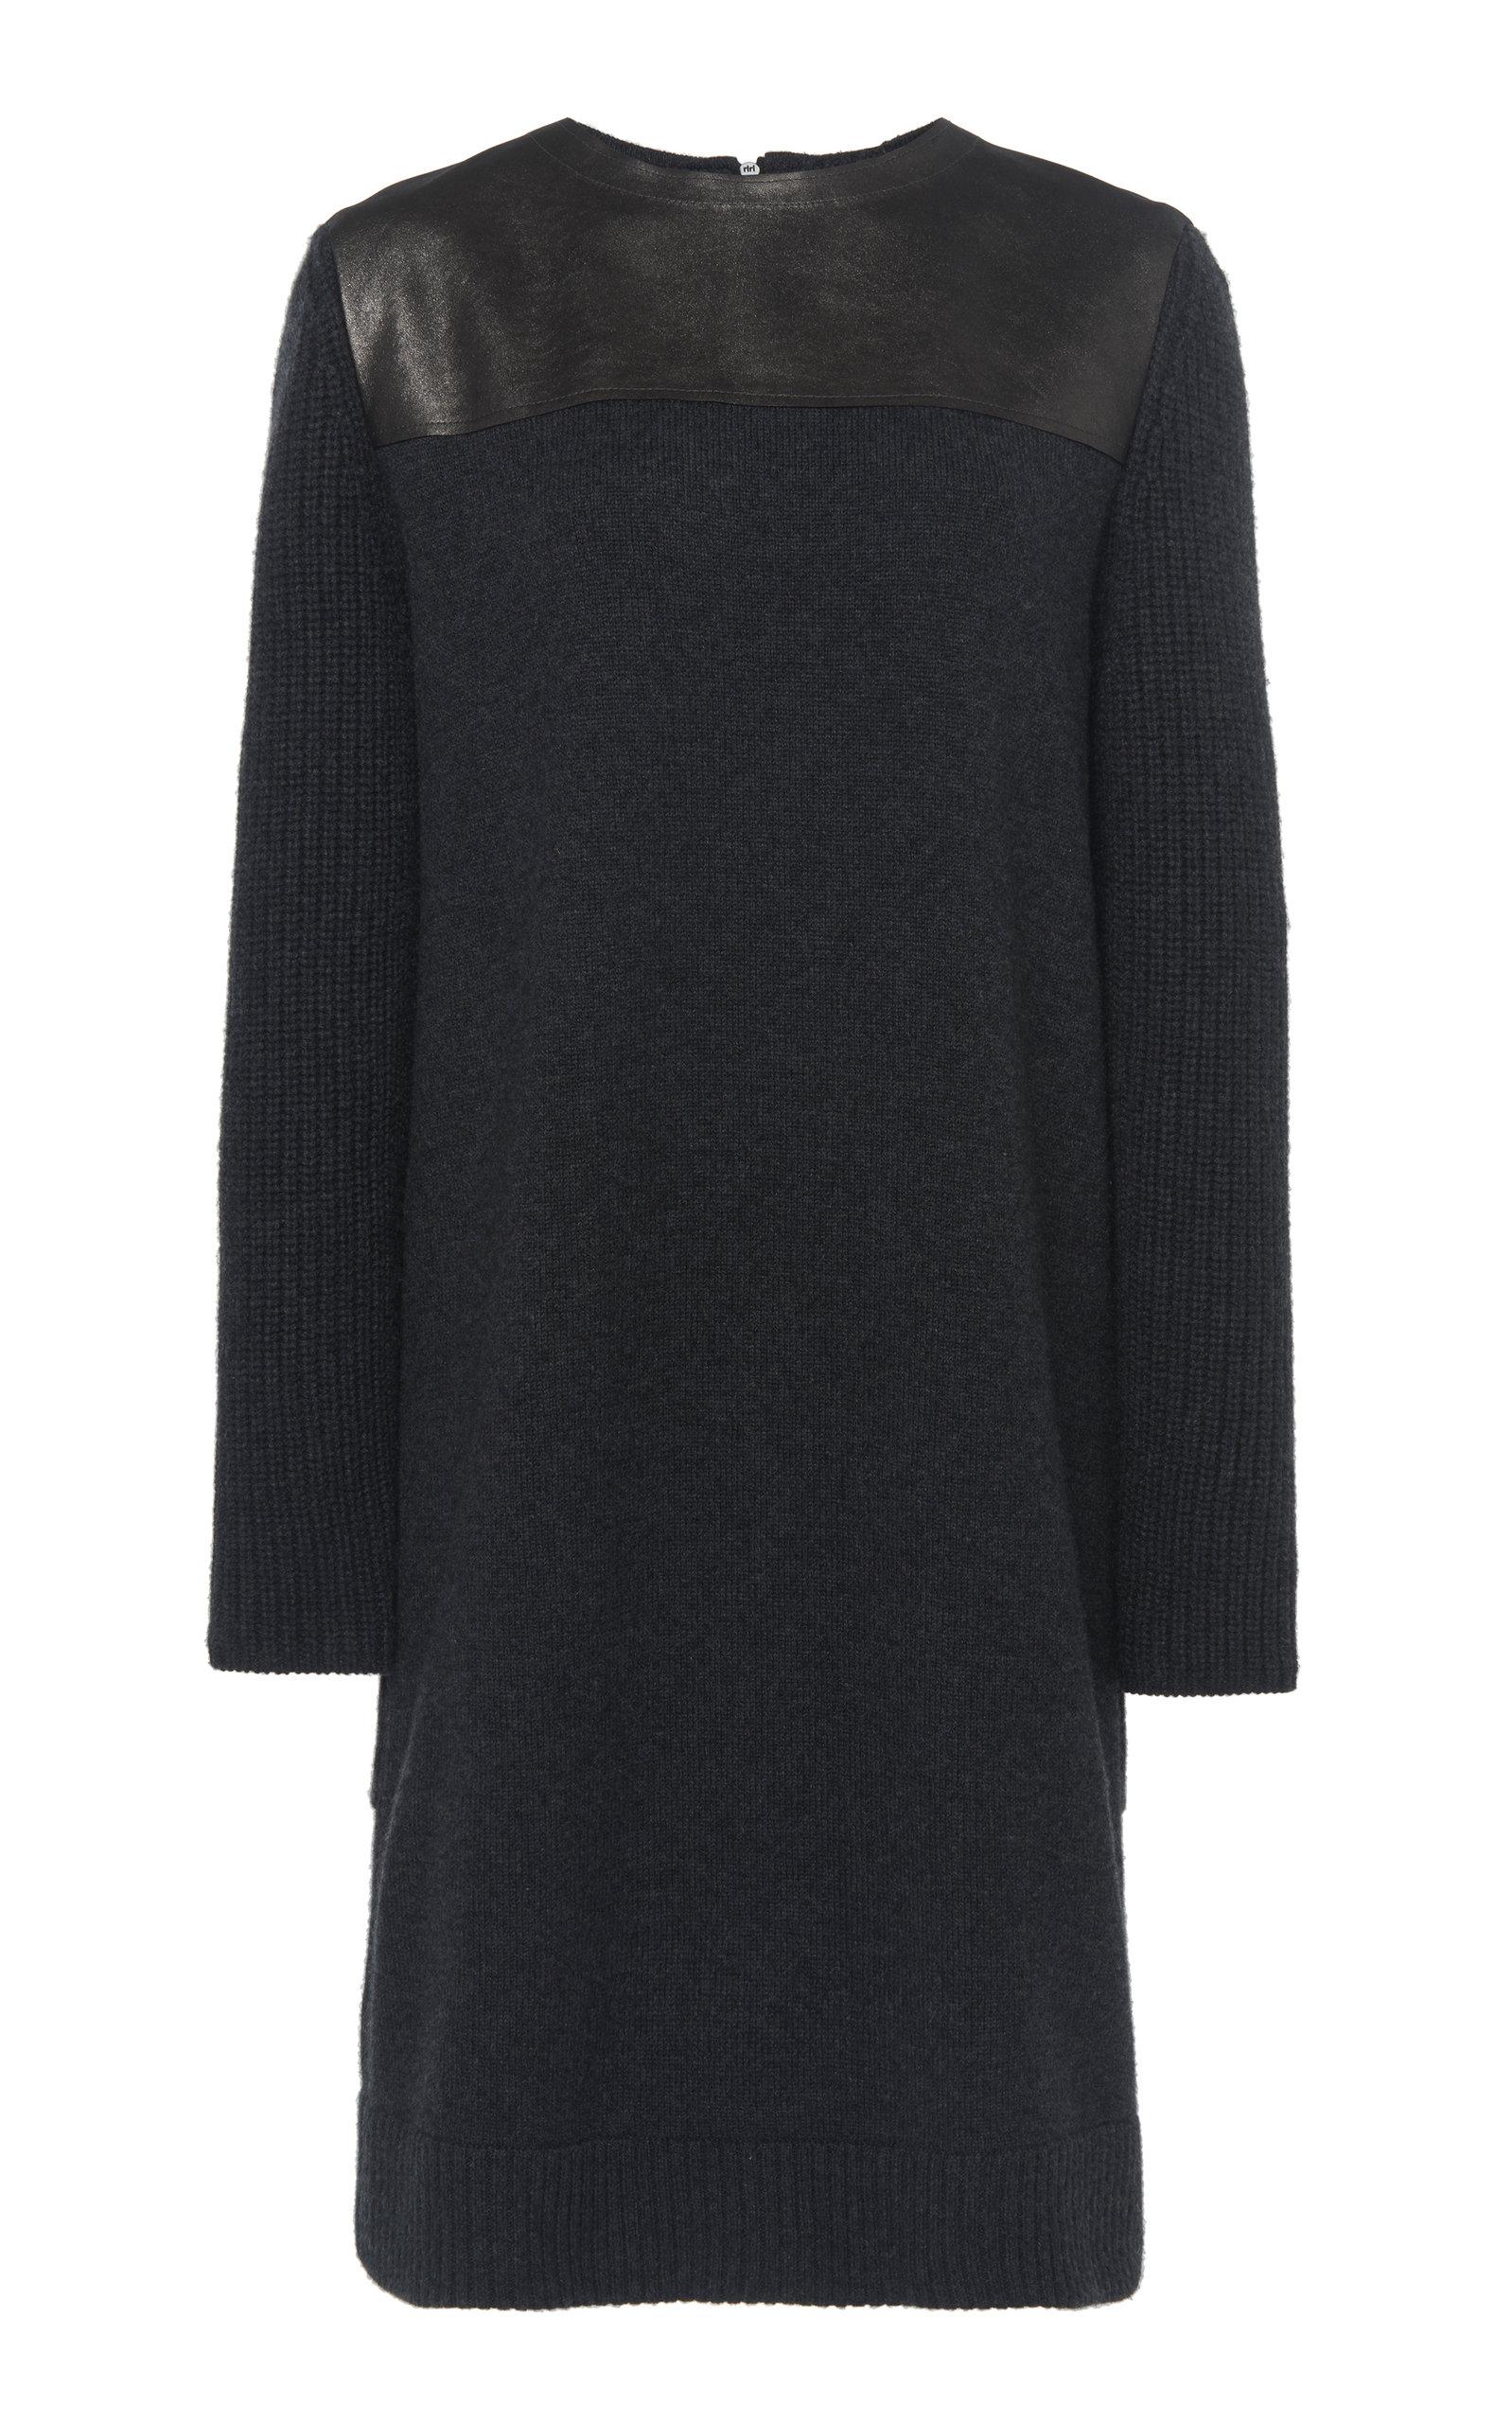 3b1a4a8b06f47 Leather-Trimmed Cashmere Knit Dress by Akris | Moda Operandi